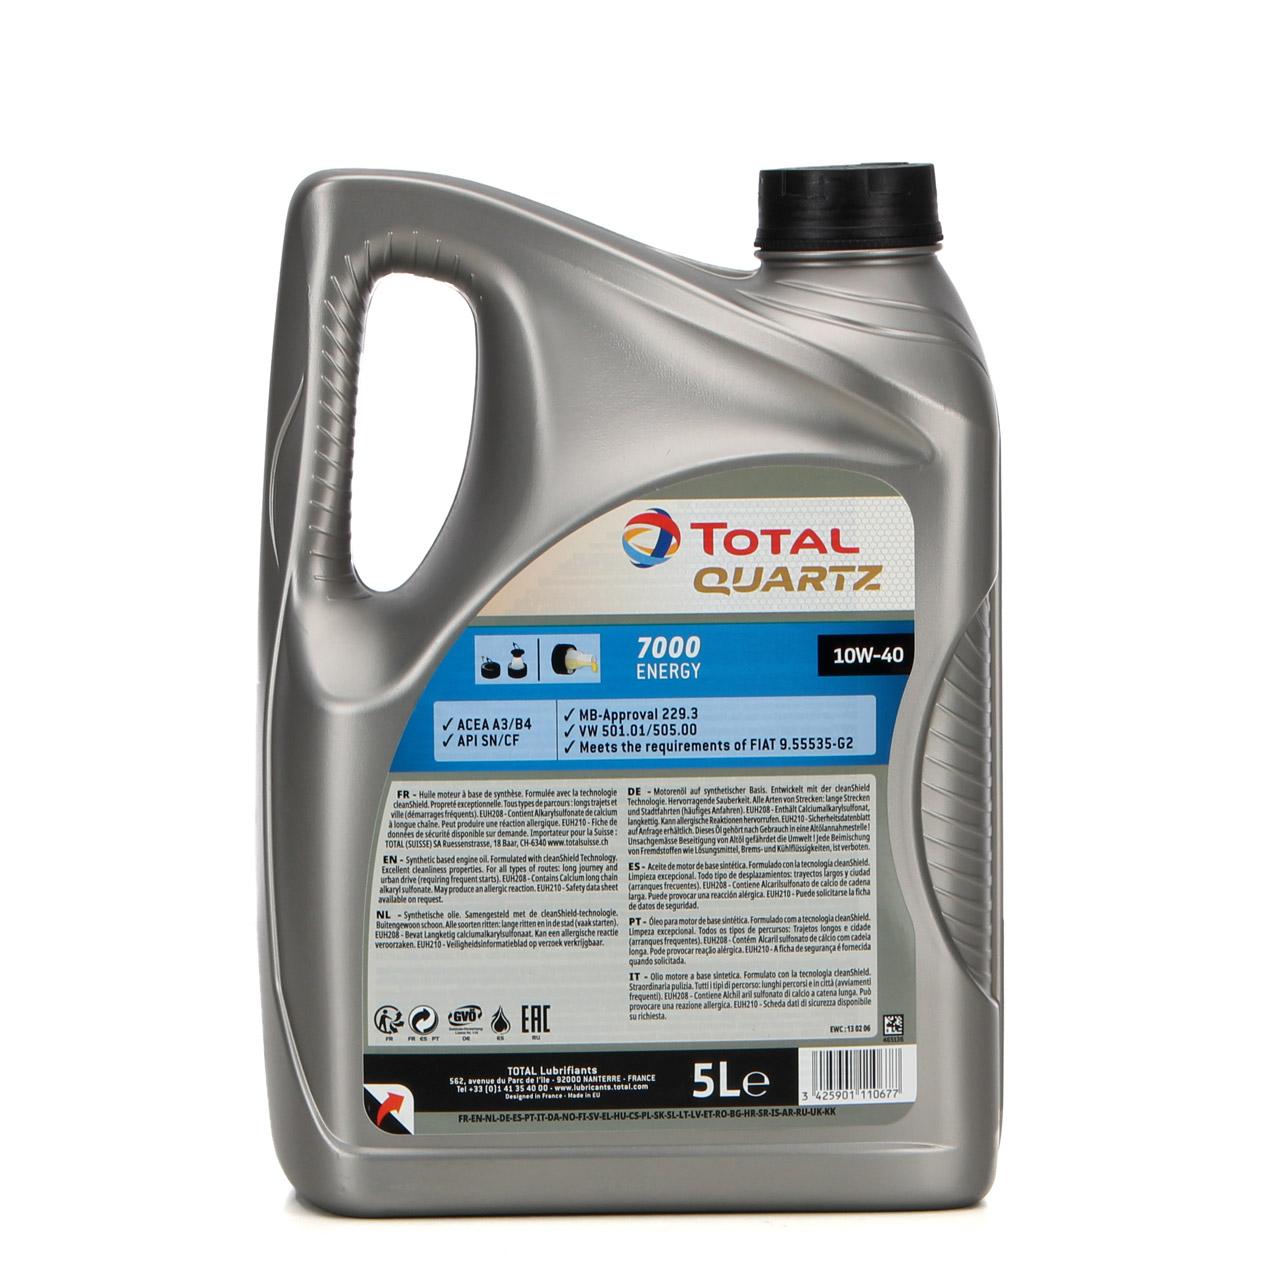 TOTAL QUARTZ 7000 ENERGY Motoröl Öl 10W-40 10W40 VW 501.01/505.00 - 5L 5 Liter